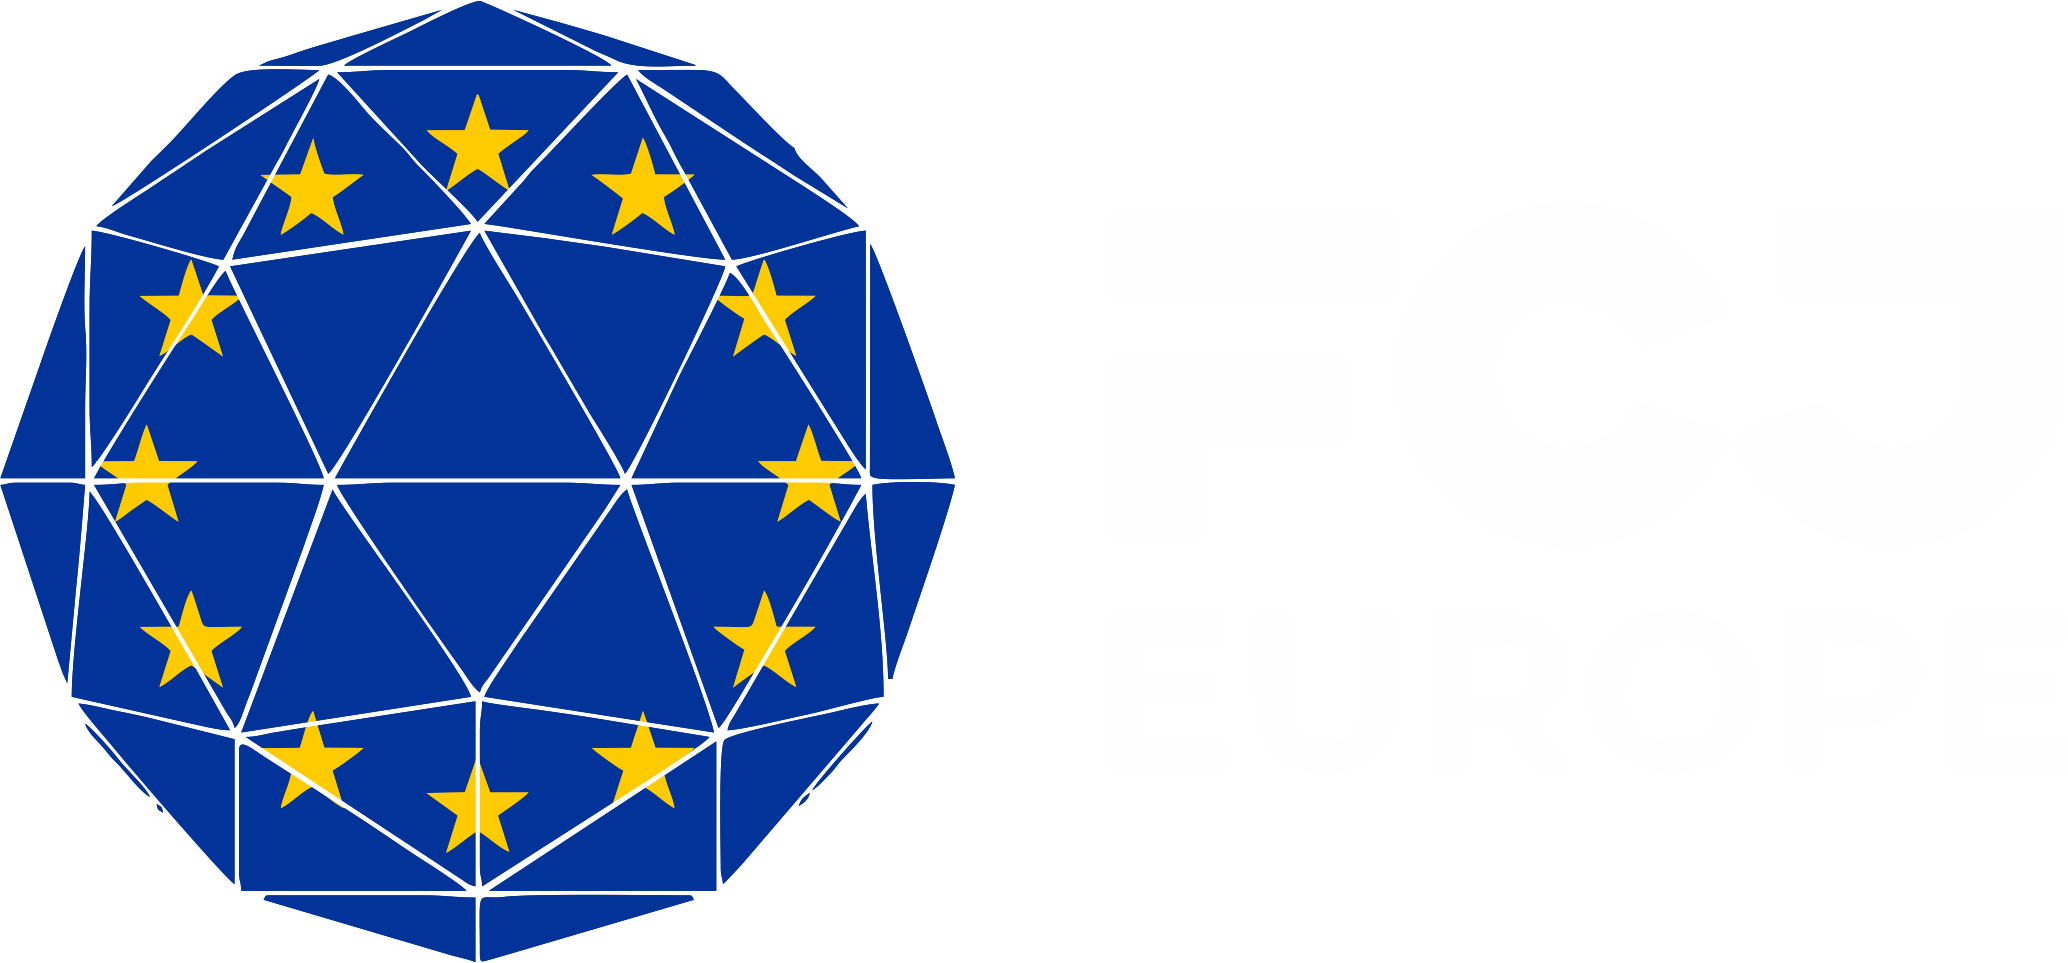 logo fcj europe